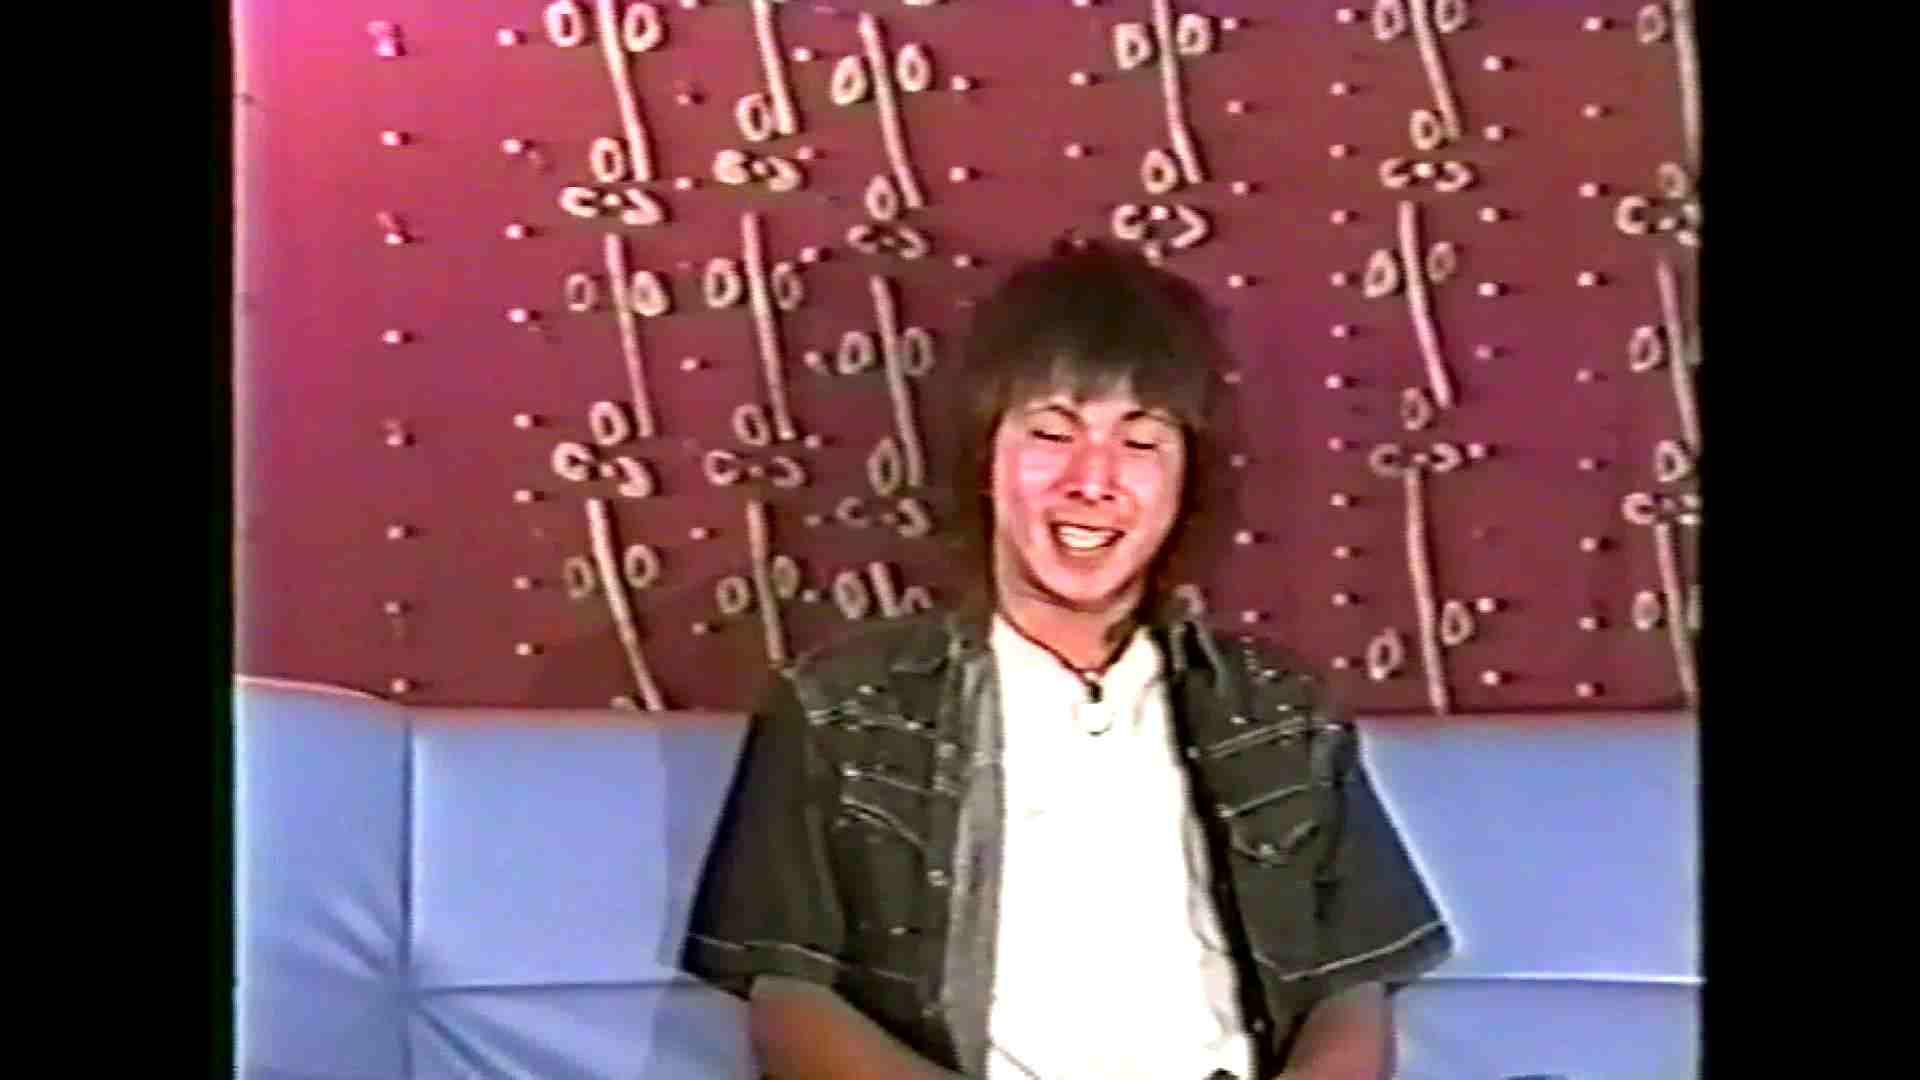 GAYBOY宏のオカズ倉庫Vol.3-1 まじ生挿入 | 口内に発射 ペニス画像 98pic 41